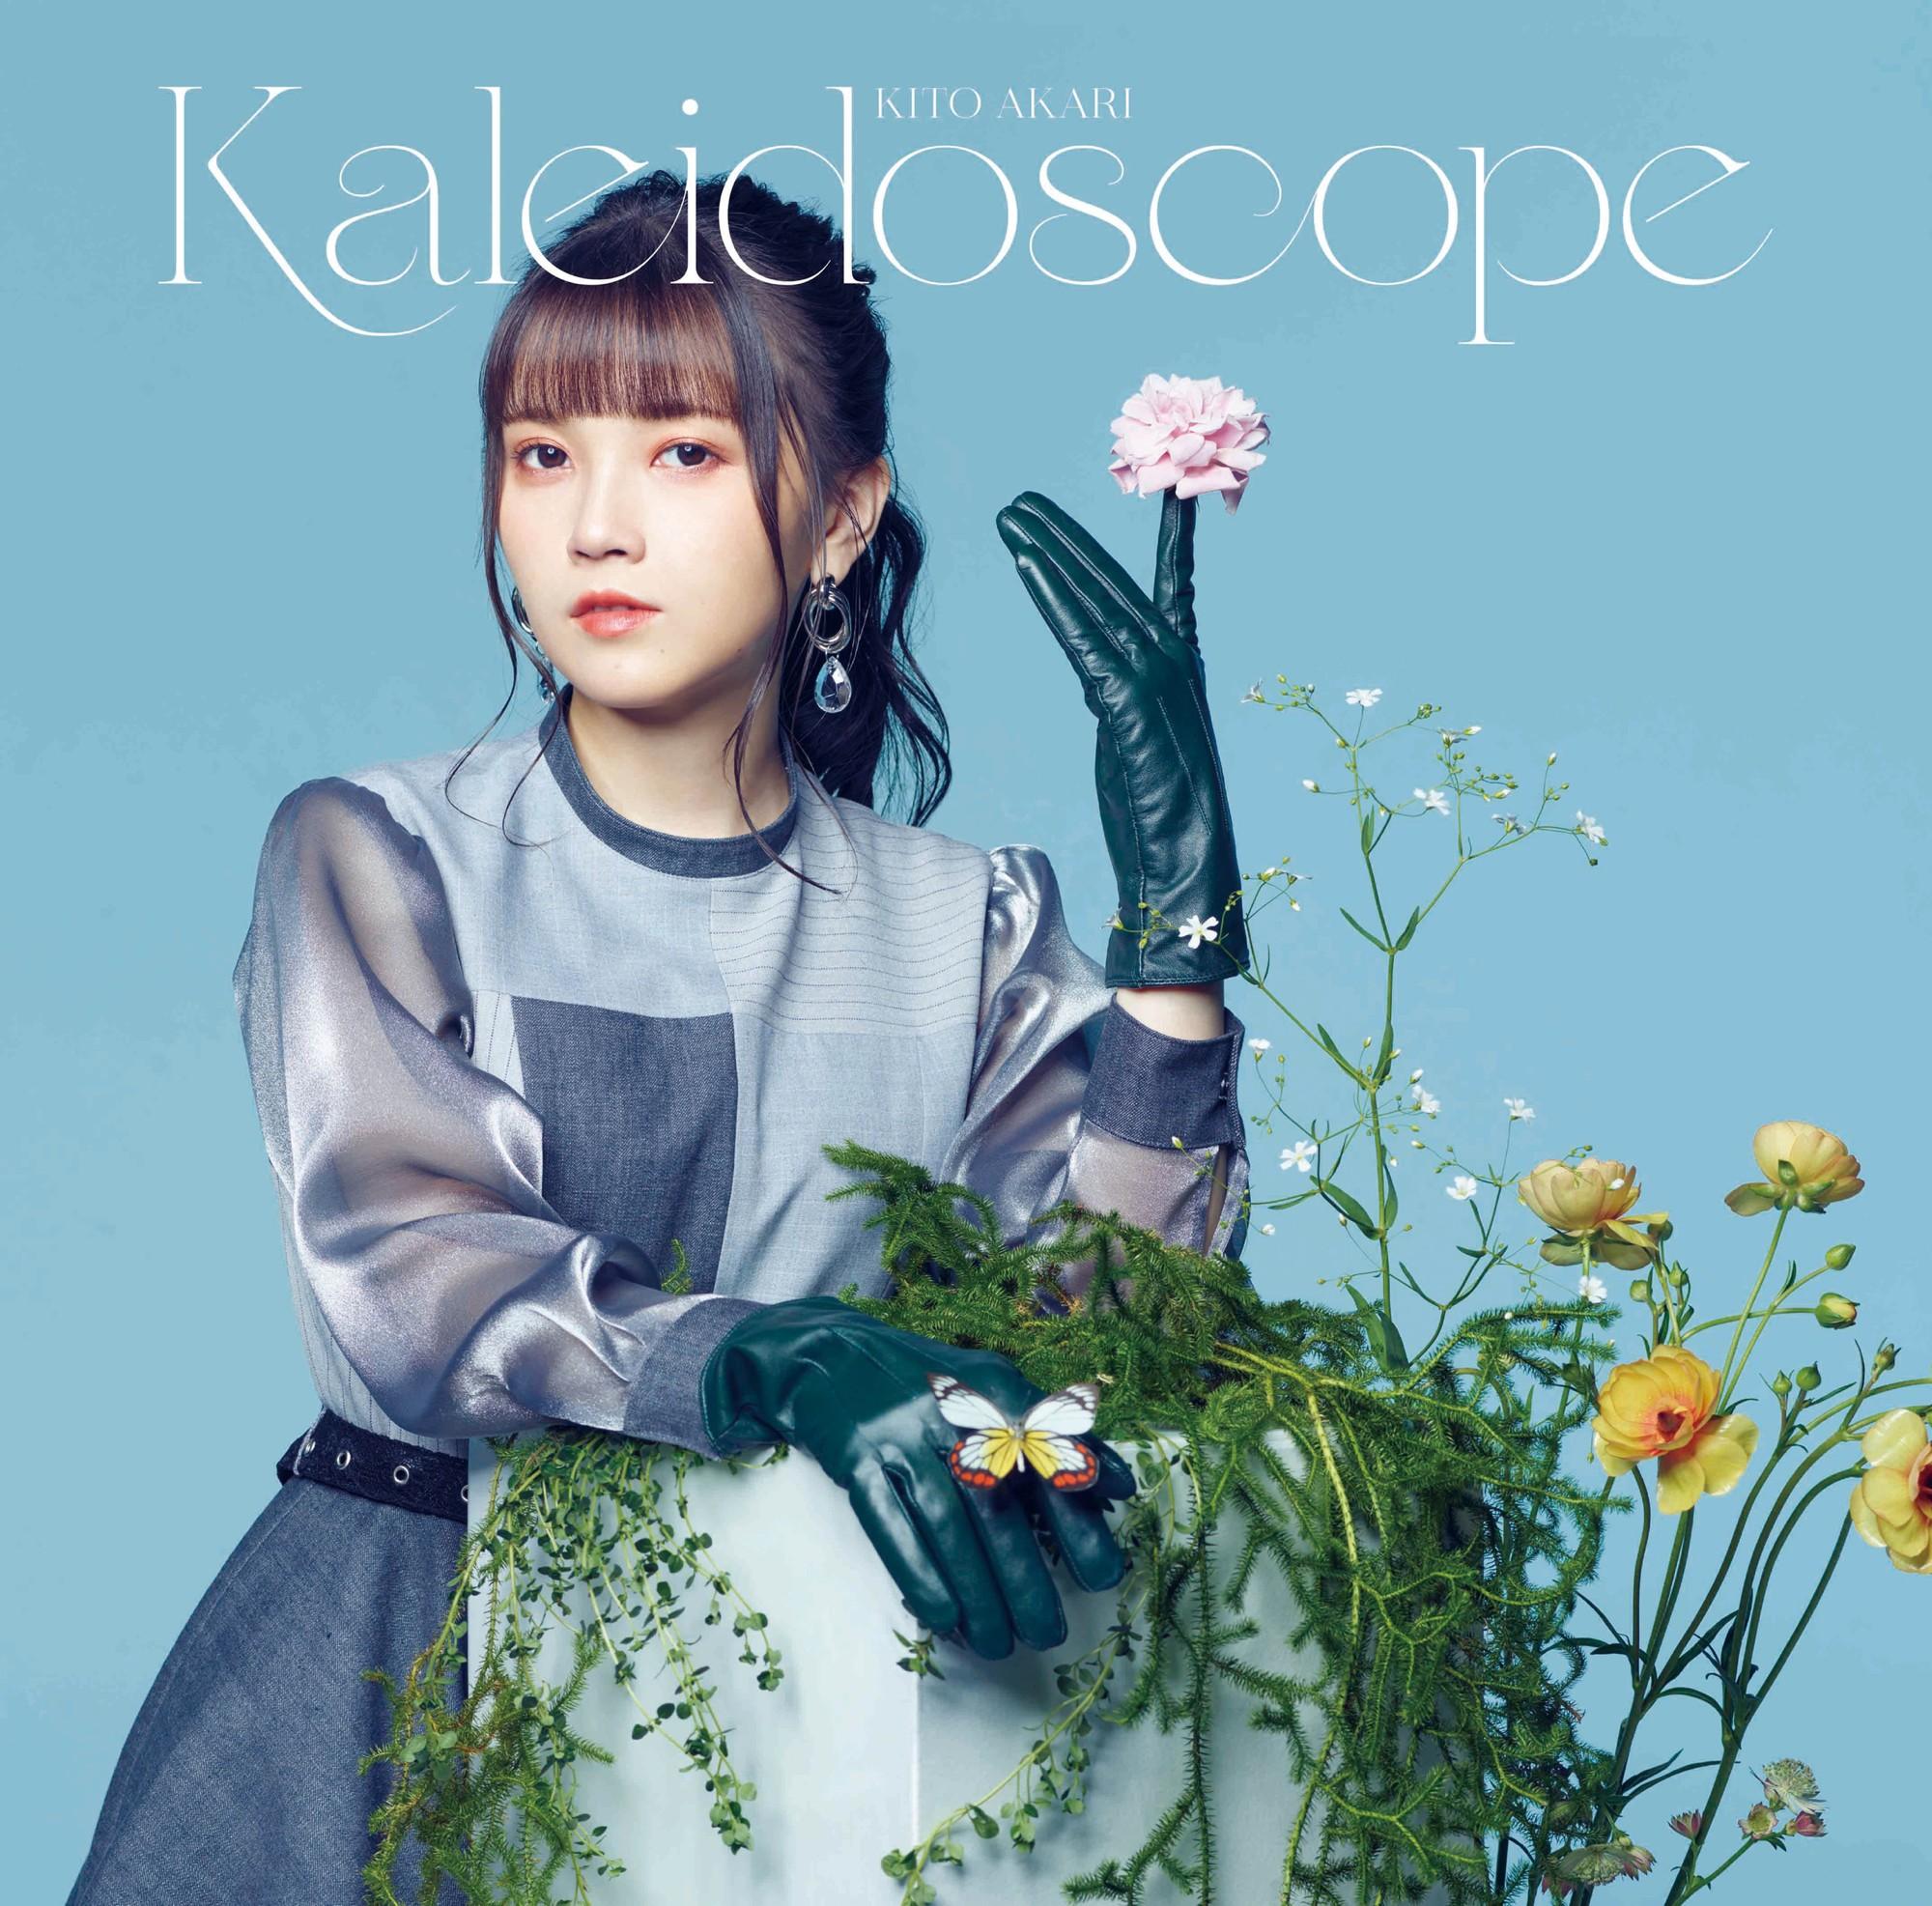 鬼頭明里 (Akari Kito) – Kaleidoscope [24bit Lossless + MP3 320 / WEB] [2021.08.04]